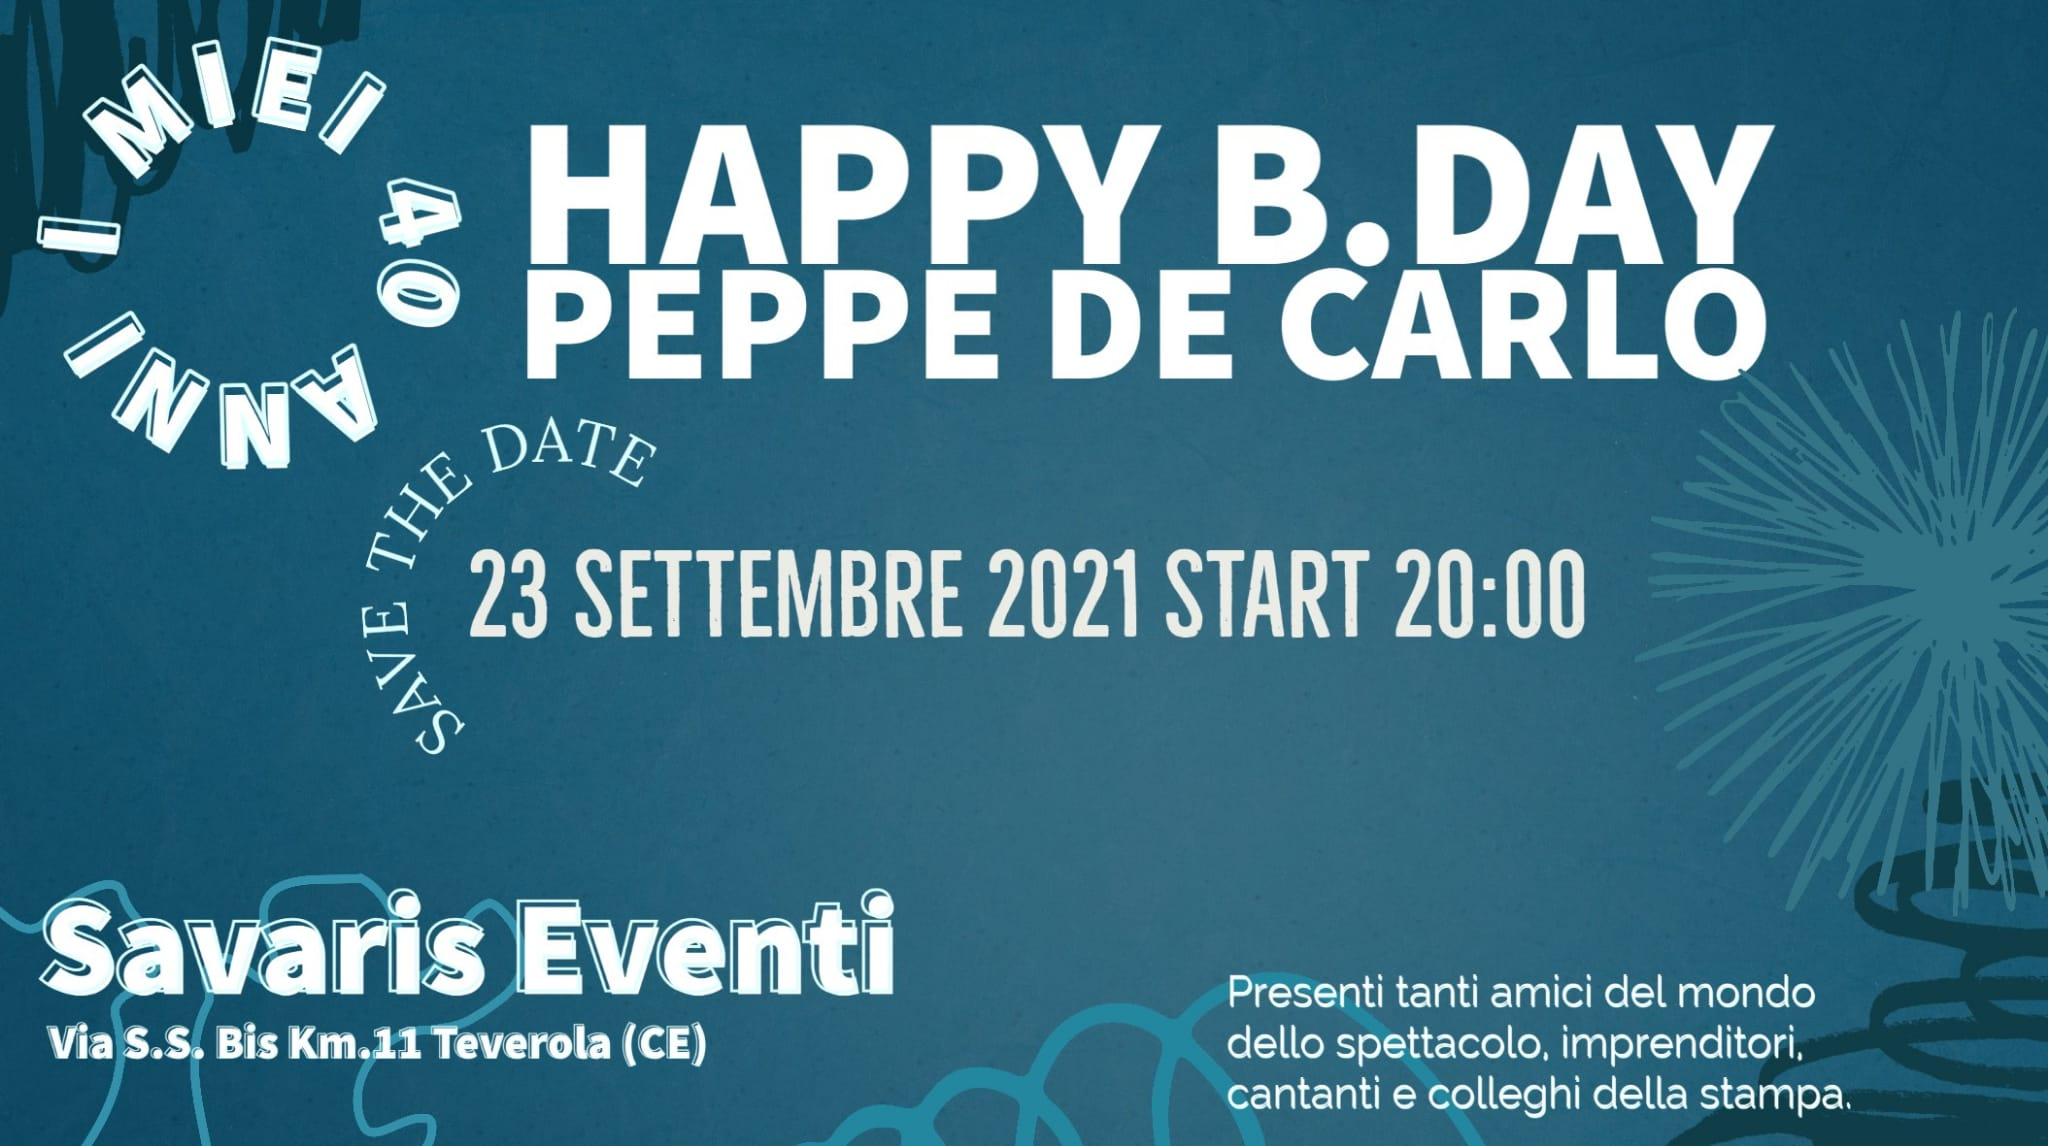 Happy Birthday per Giuseppe De Carlo, e sono 40